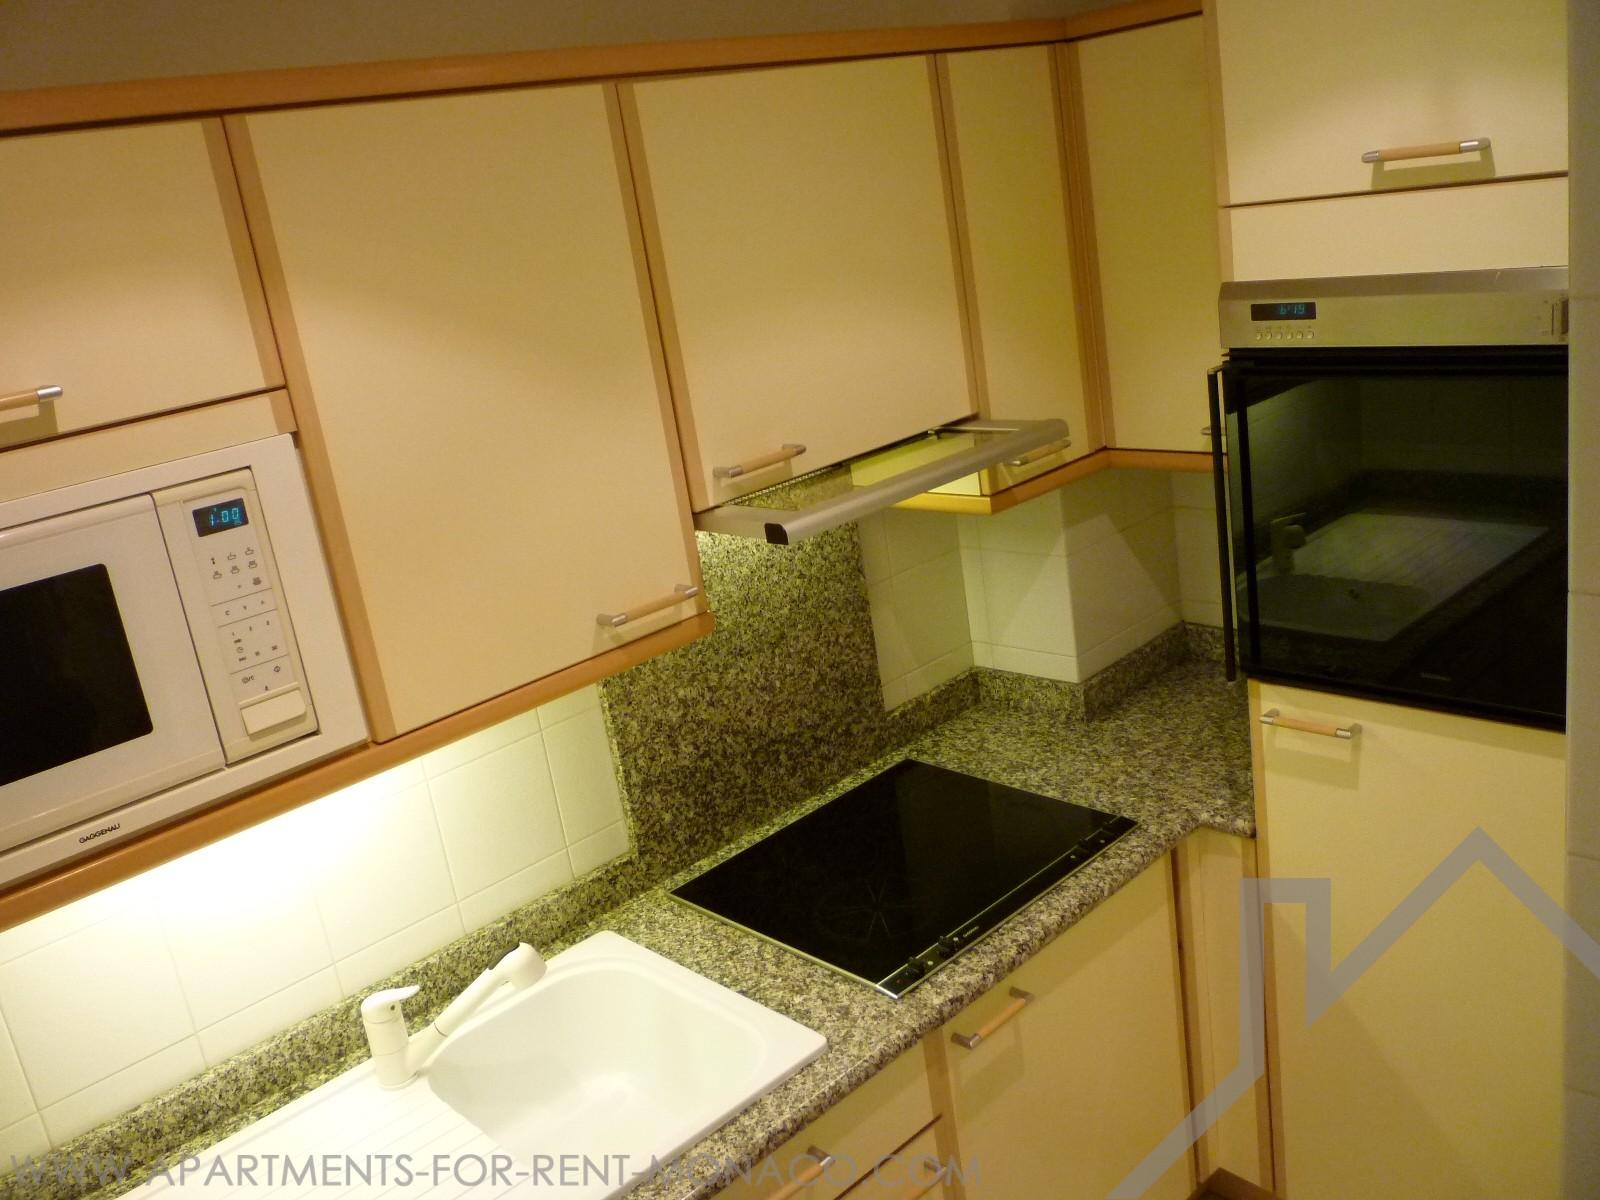 garden house apartments for rent in monaco